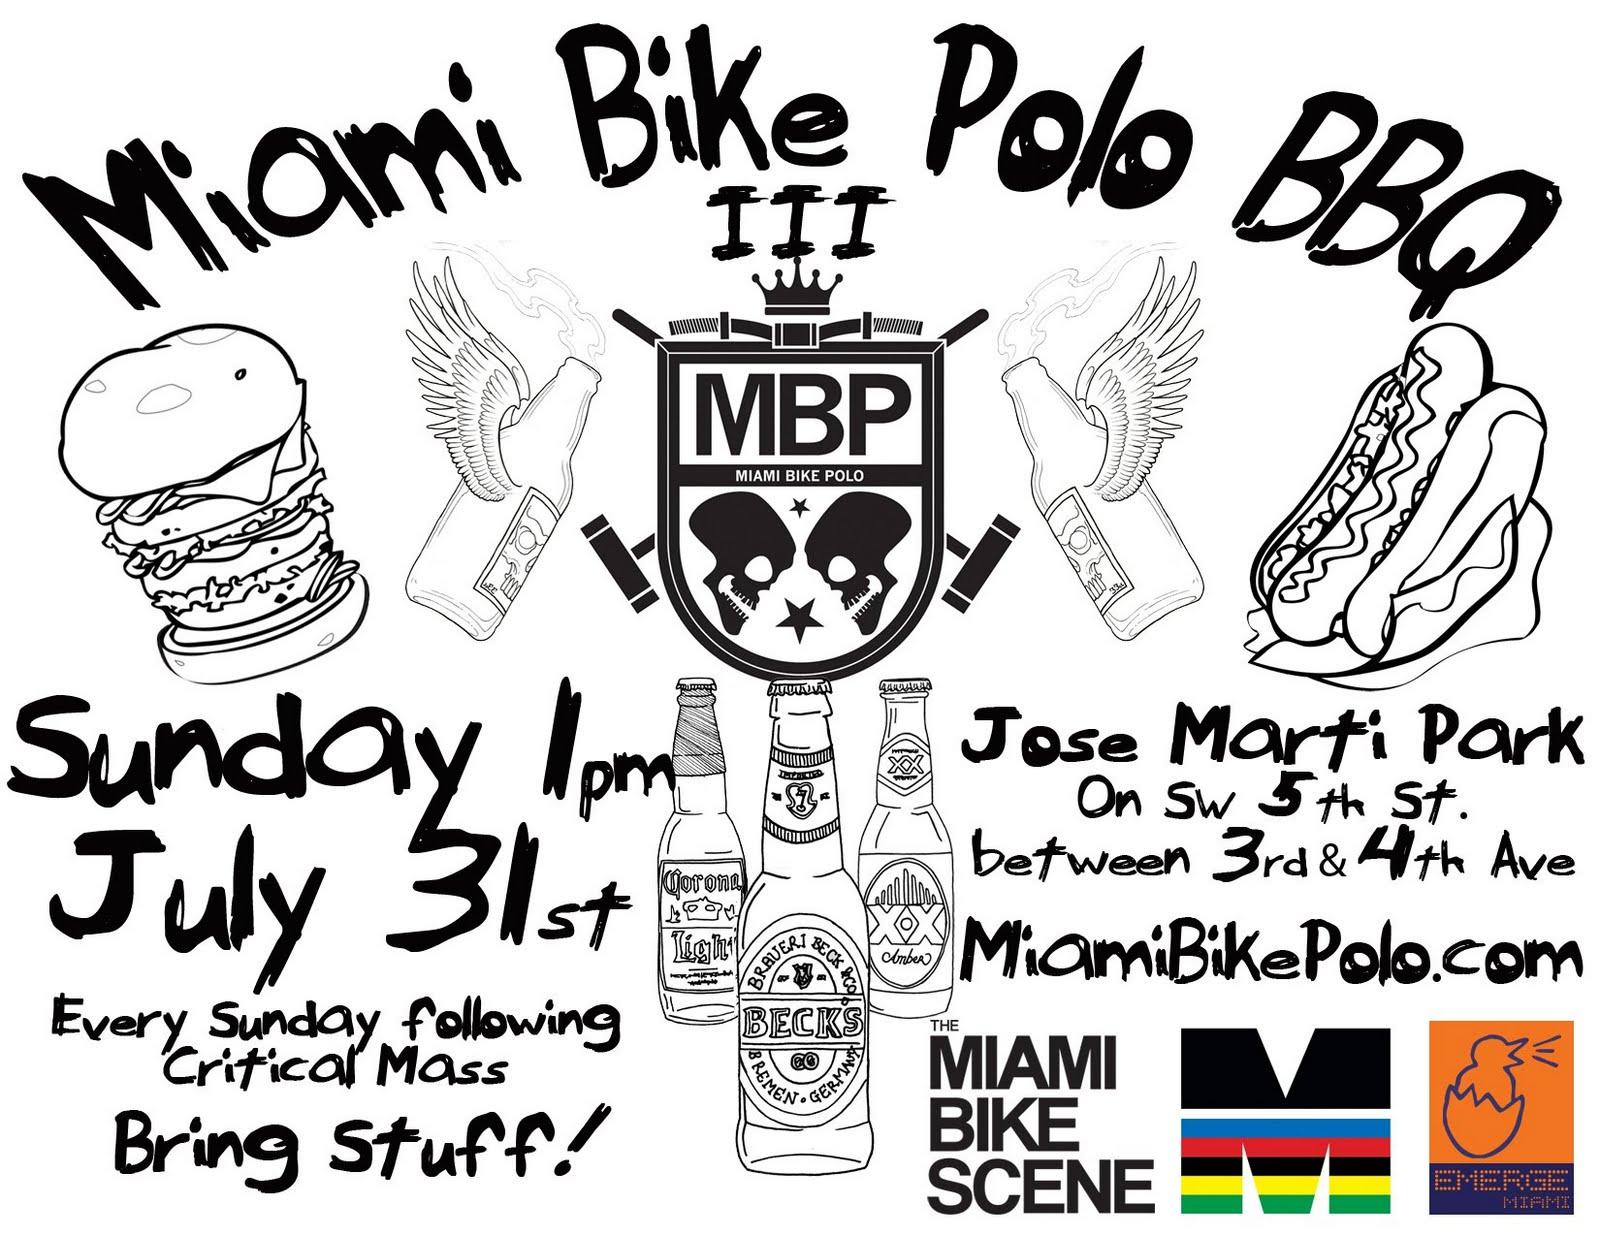 Miami Bike Polo Bbq